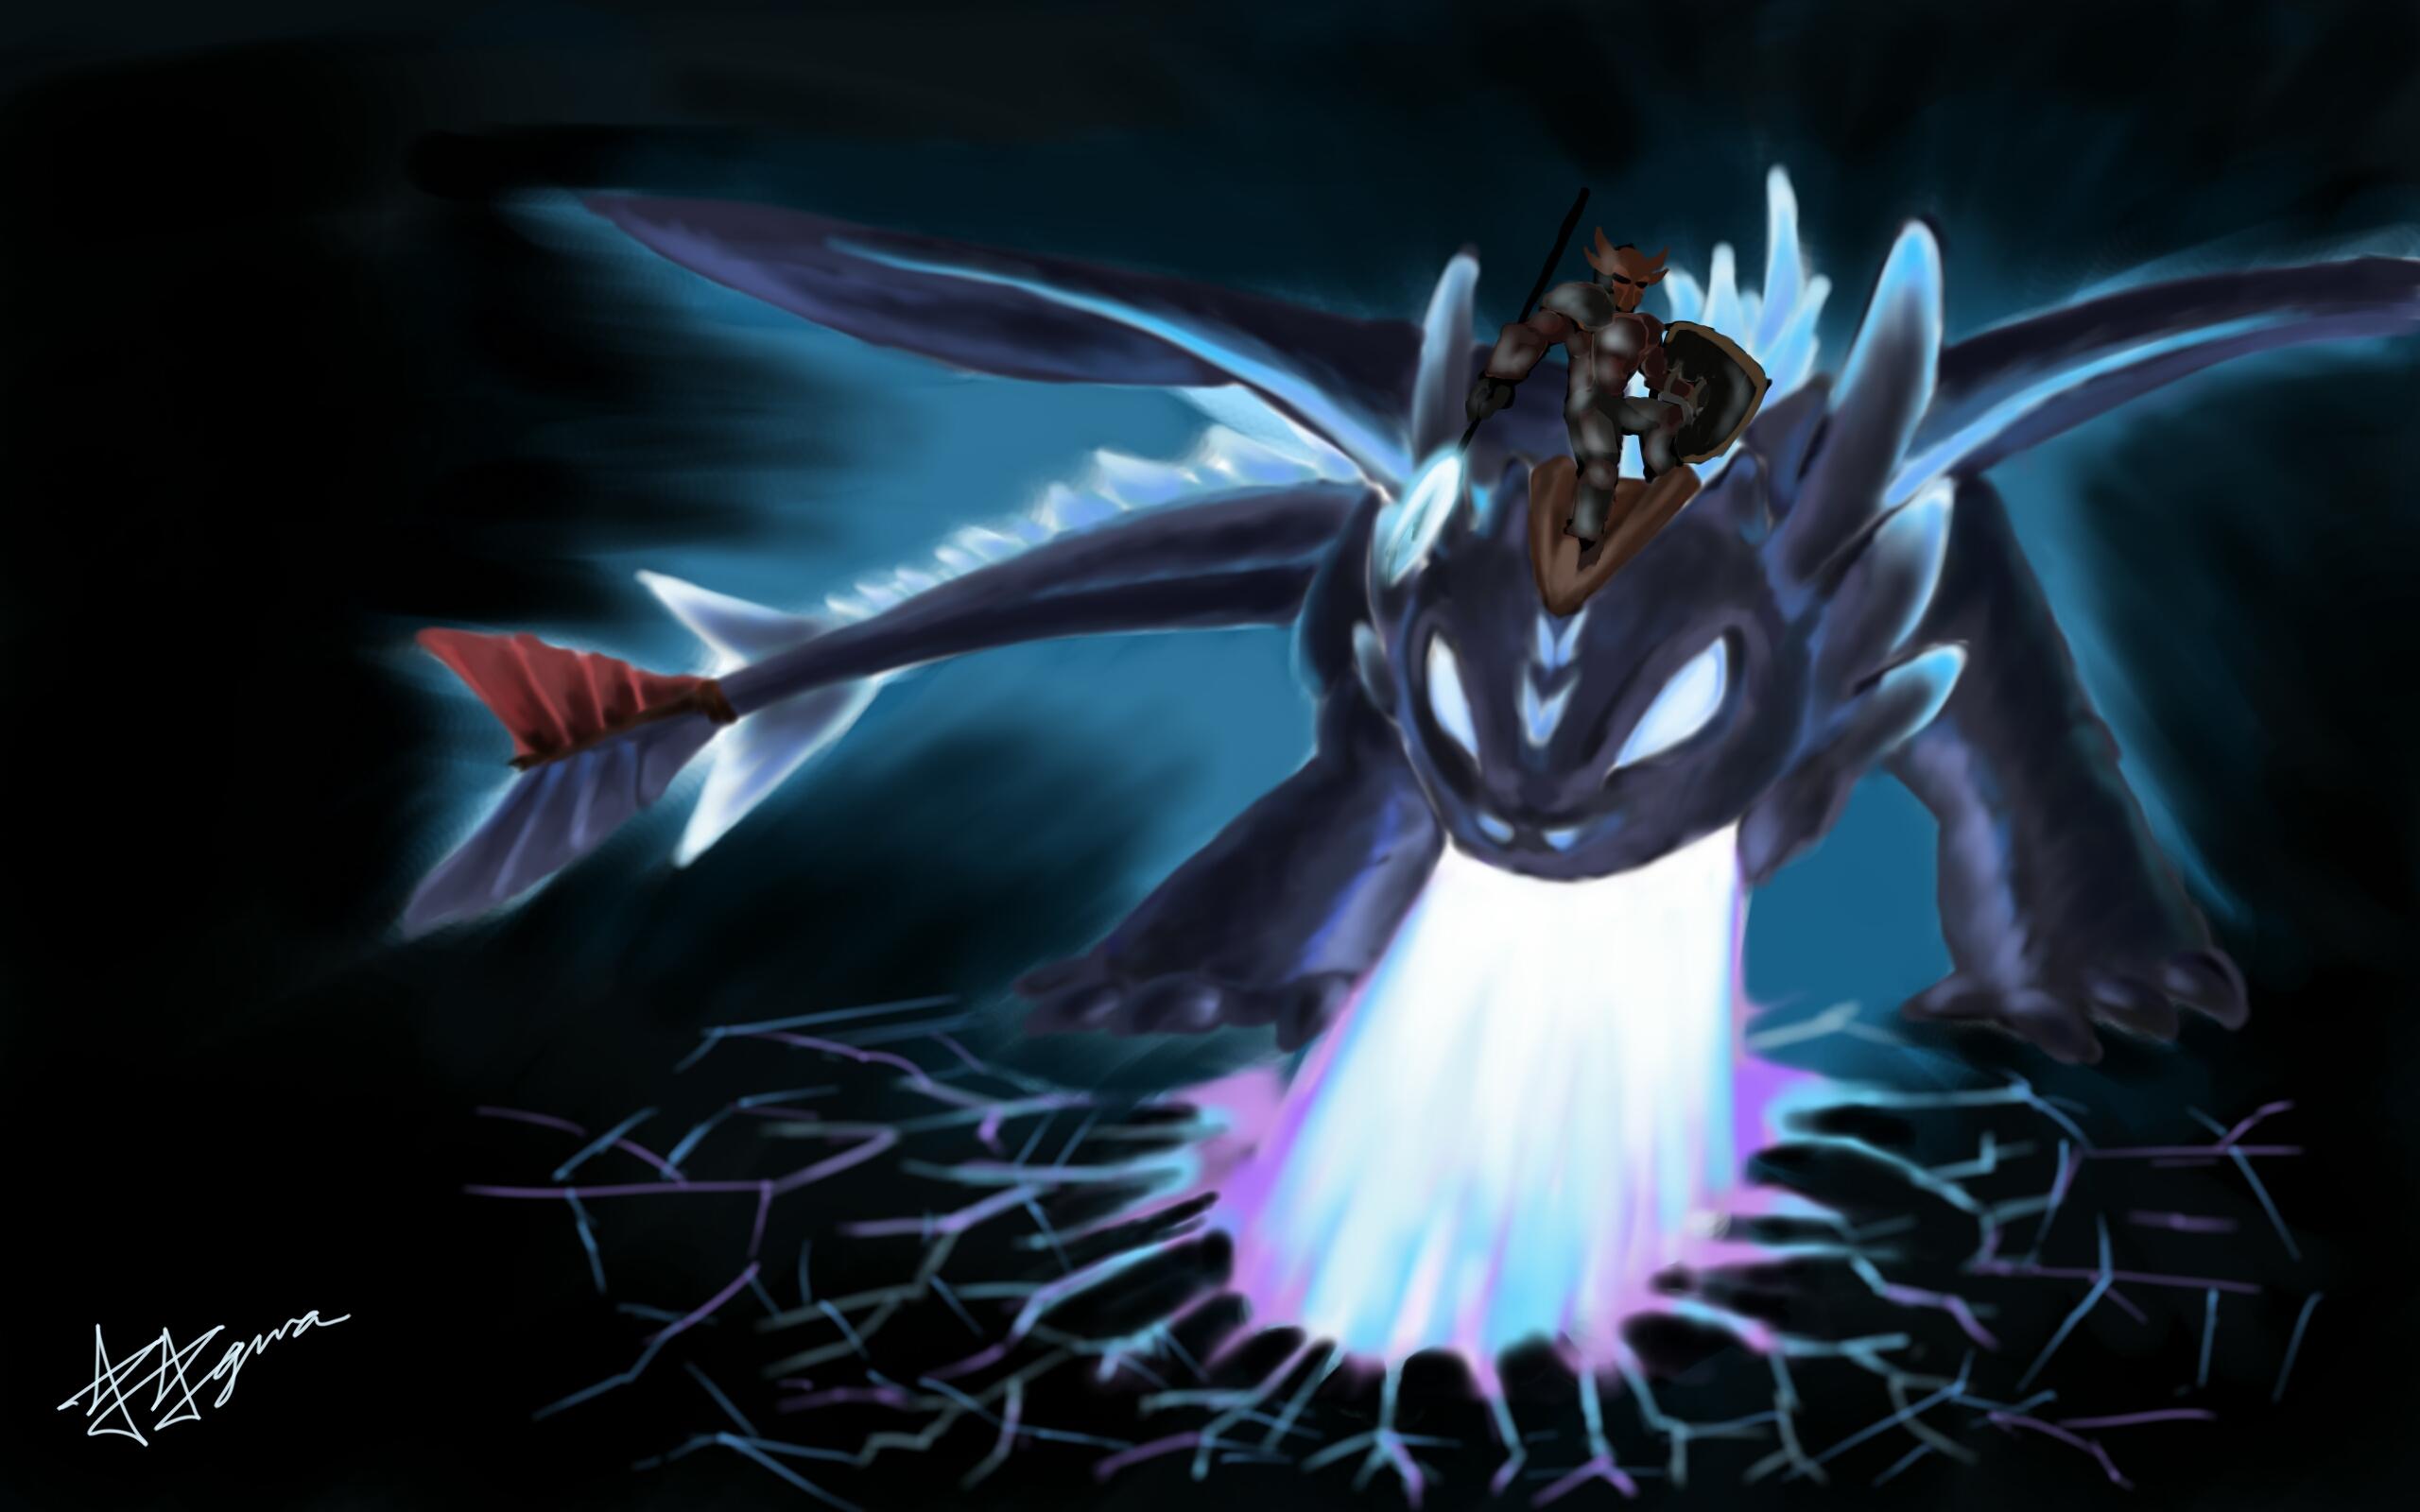 toothless, the super nightfury alpha dragonfiryaguna on deviantart